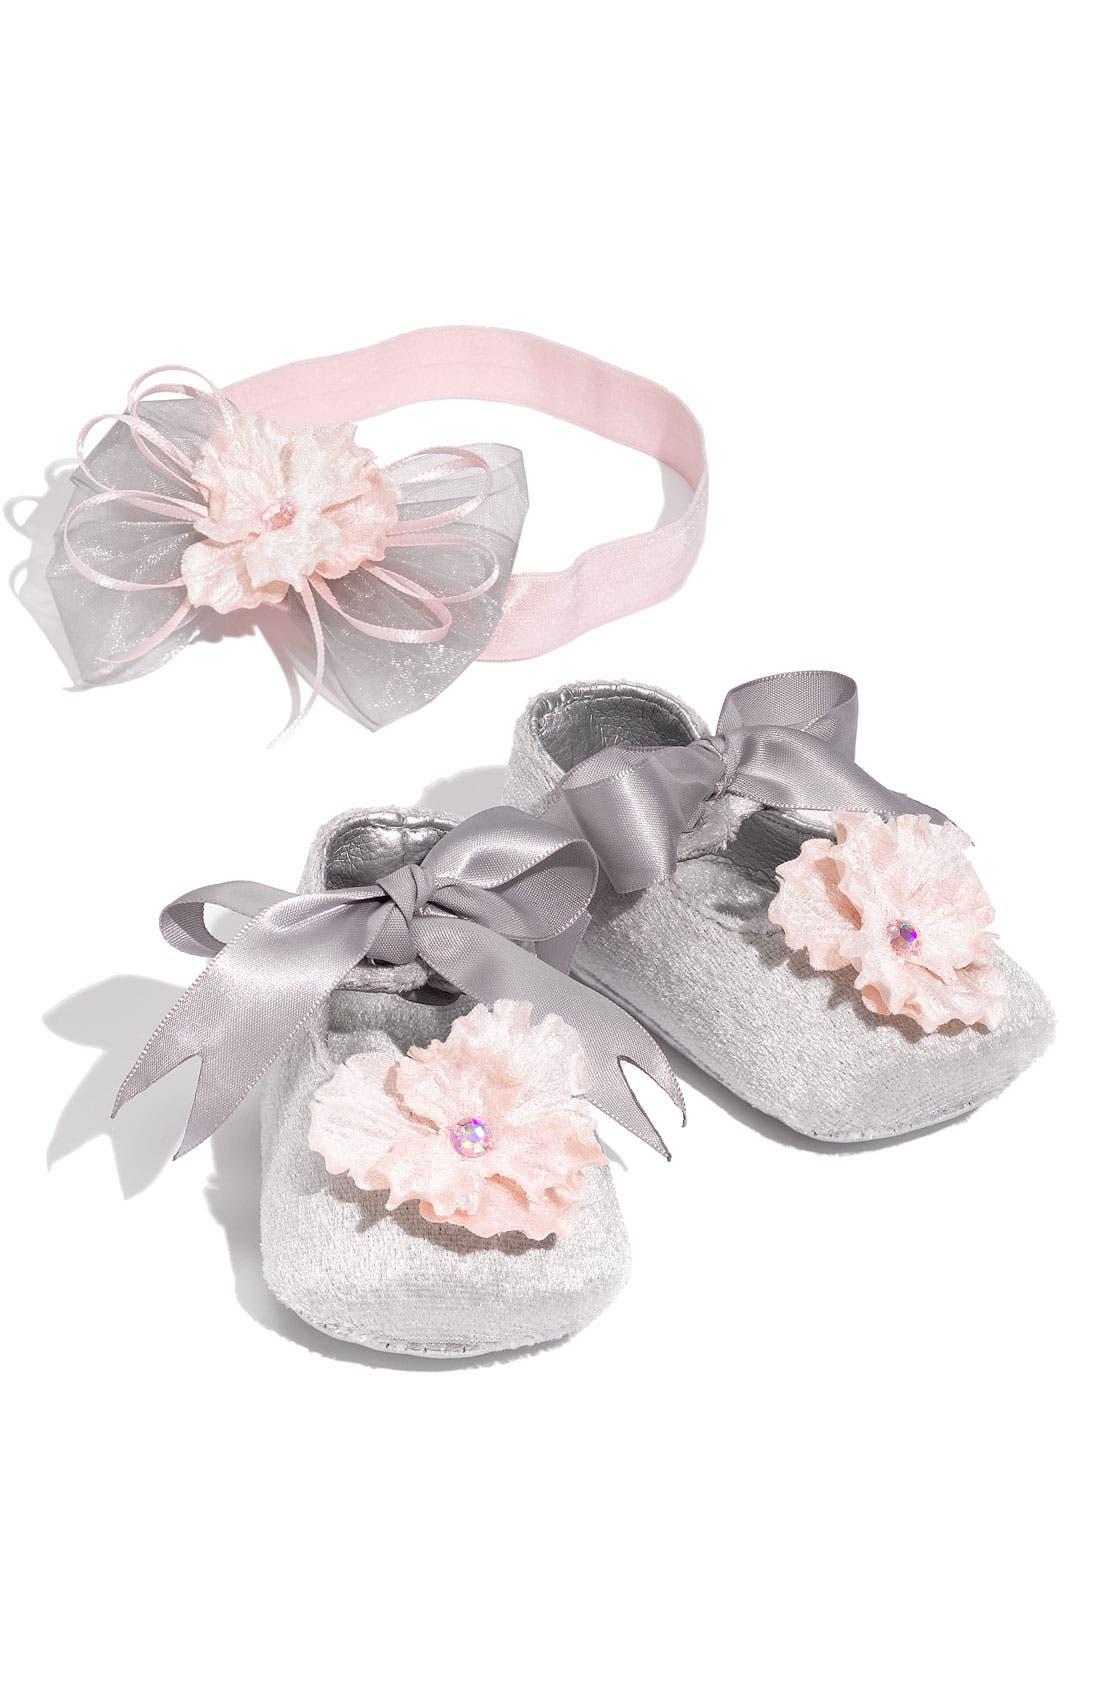 Main Image - PLH Bows & Laces Headband & Shoes Set (Infant)